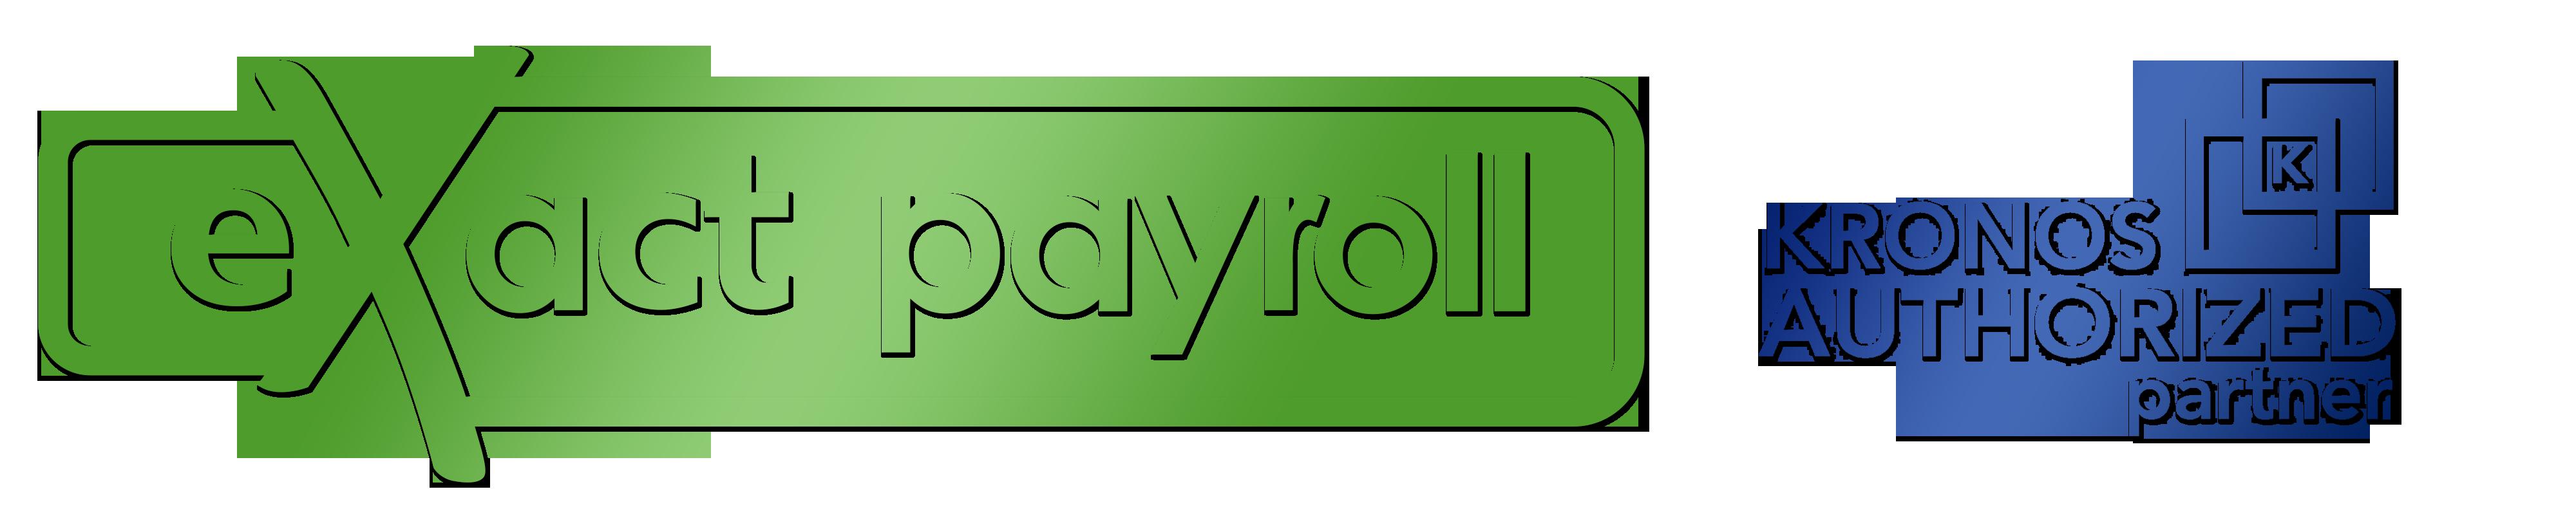 Exact site logo. Want clipart payroll tax